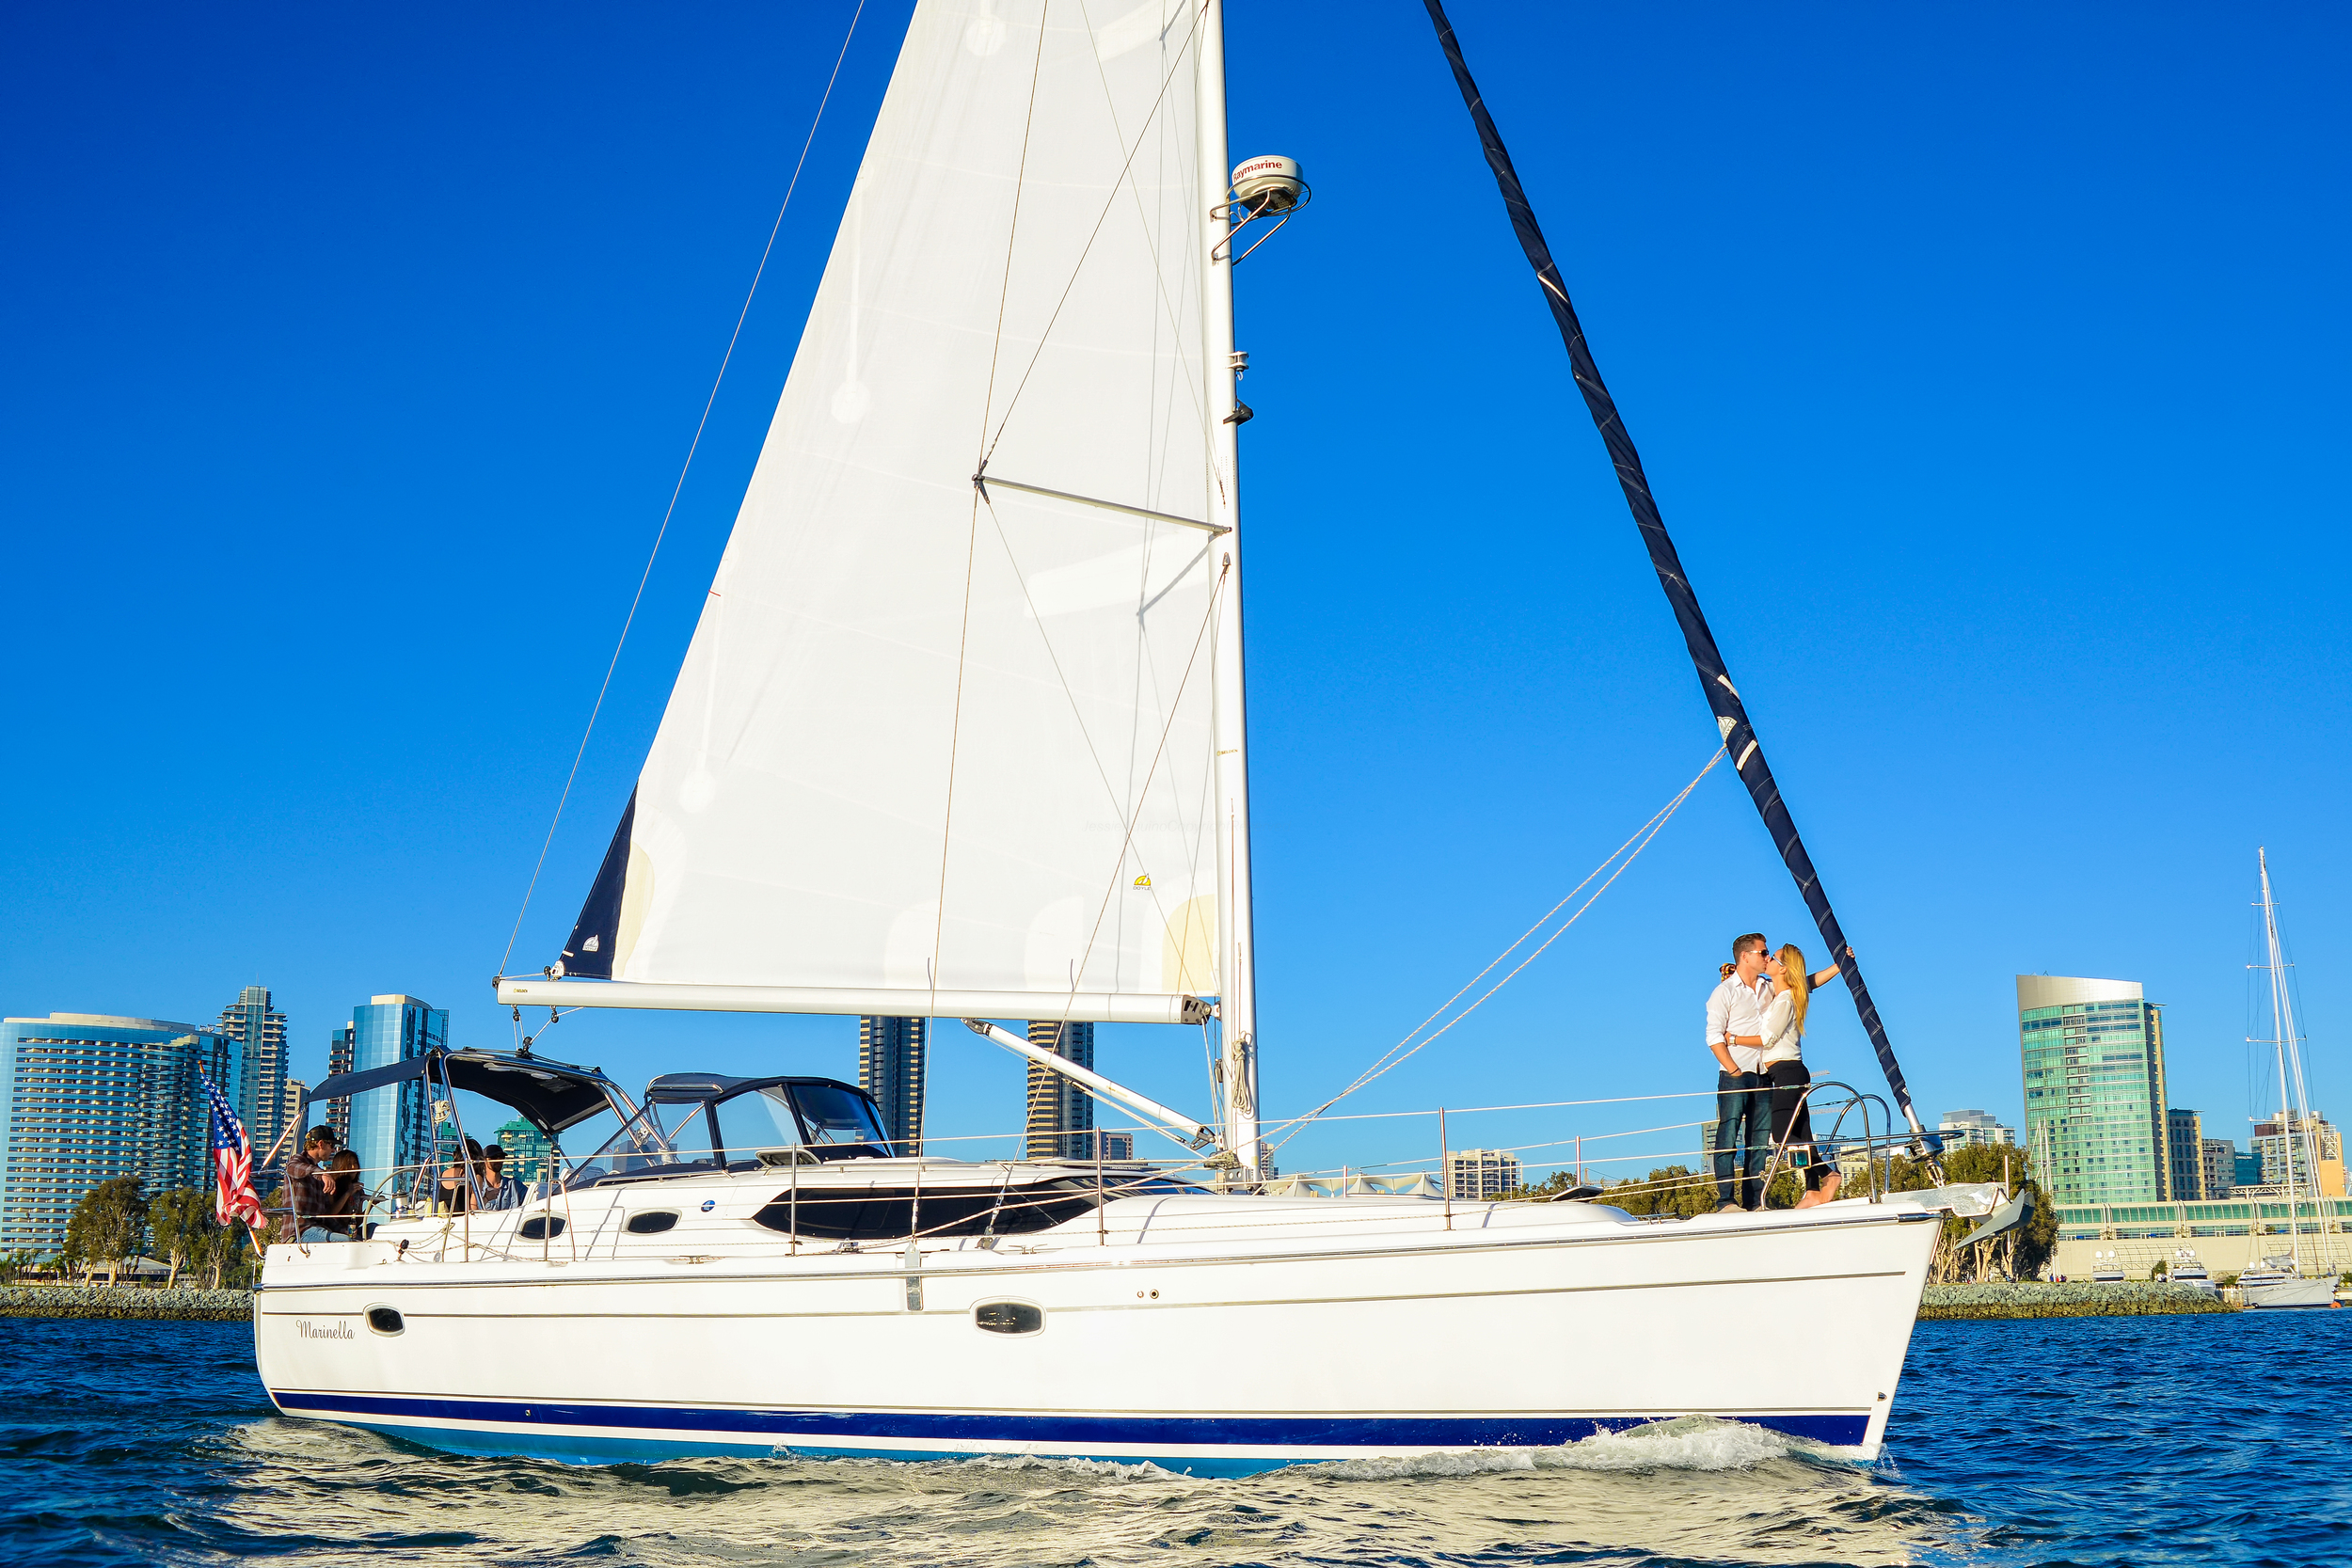 Romantic Sailing in San Diego